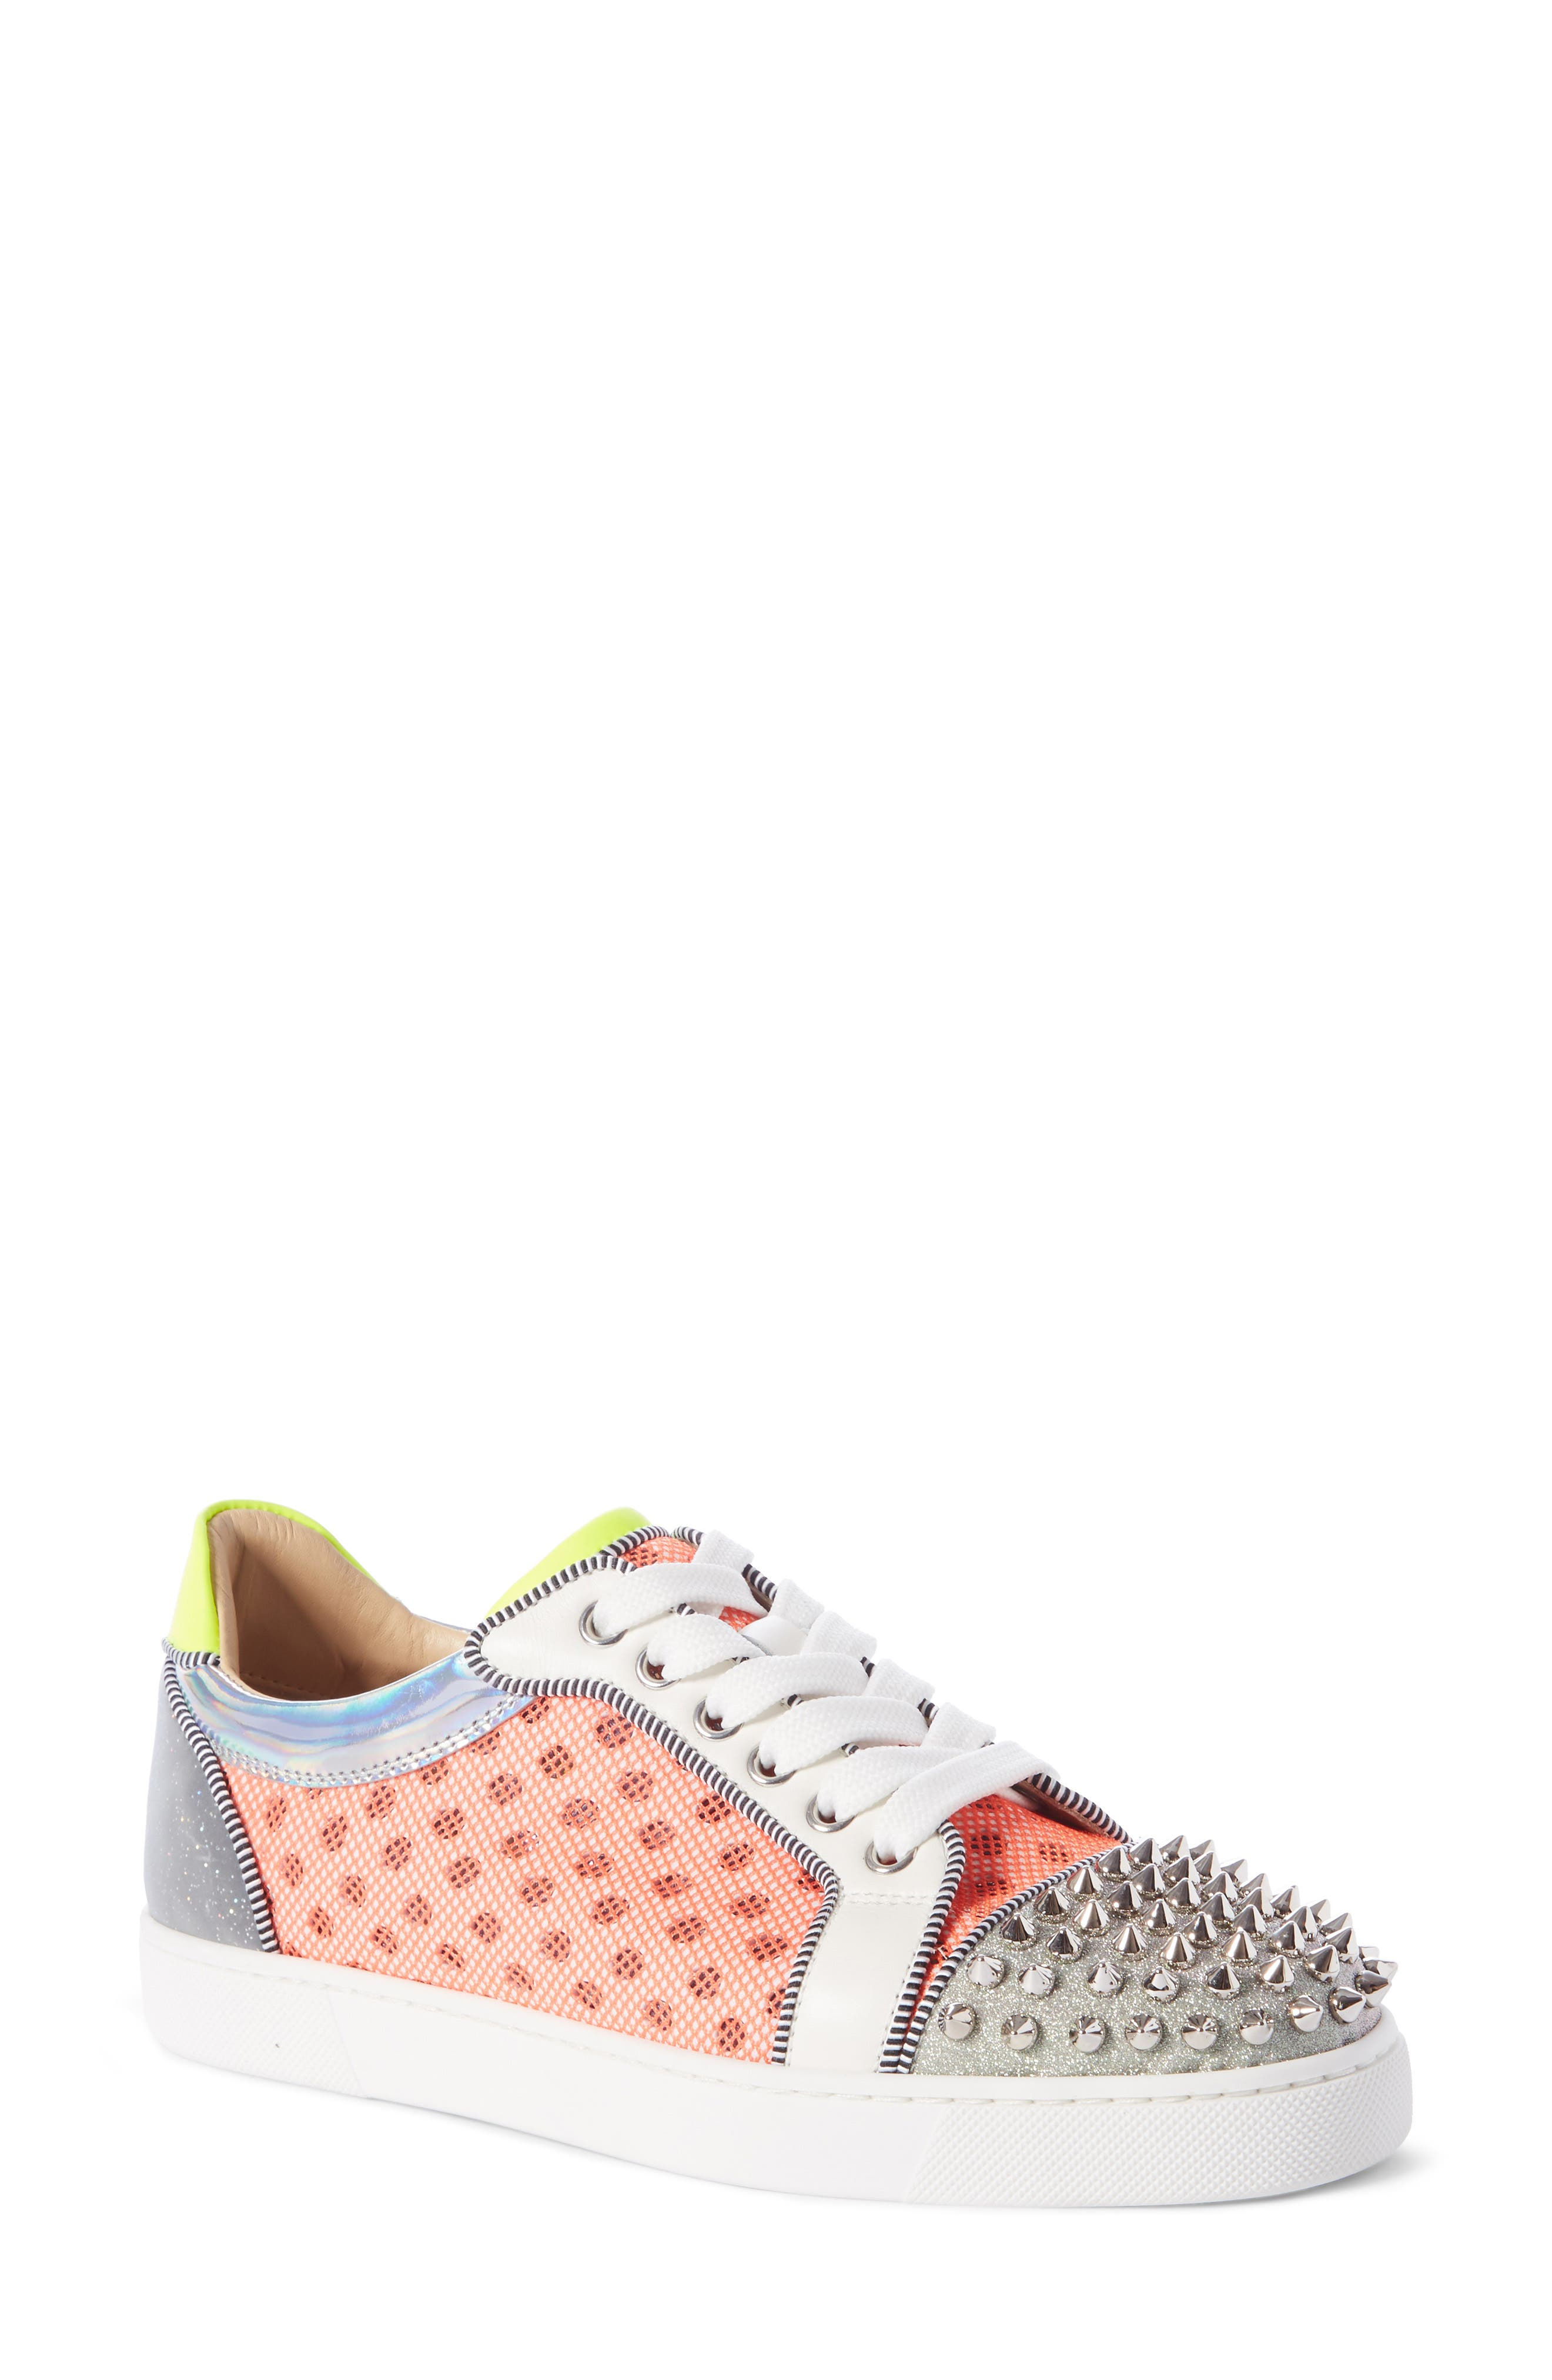 christian louboutin womens sneakers